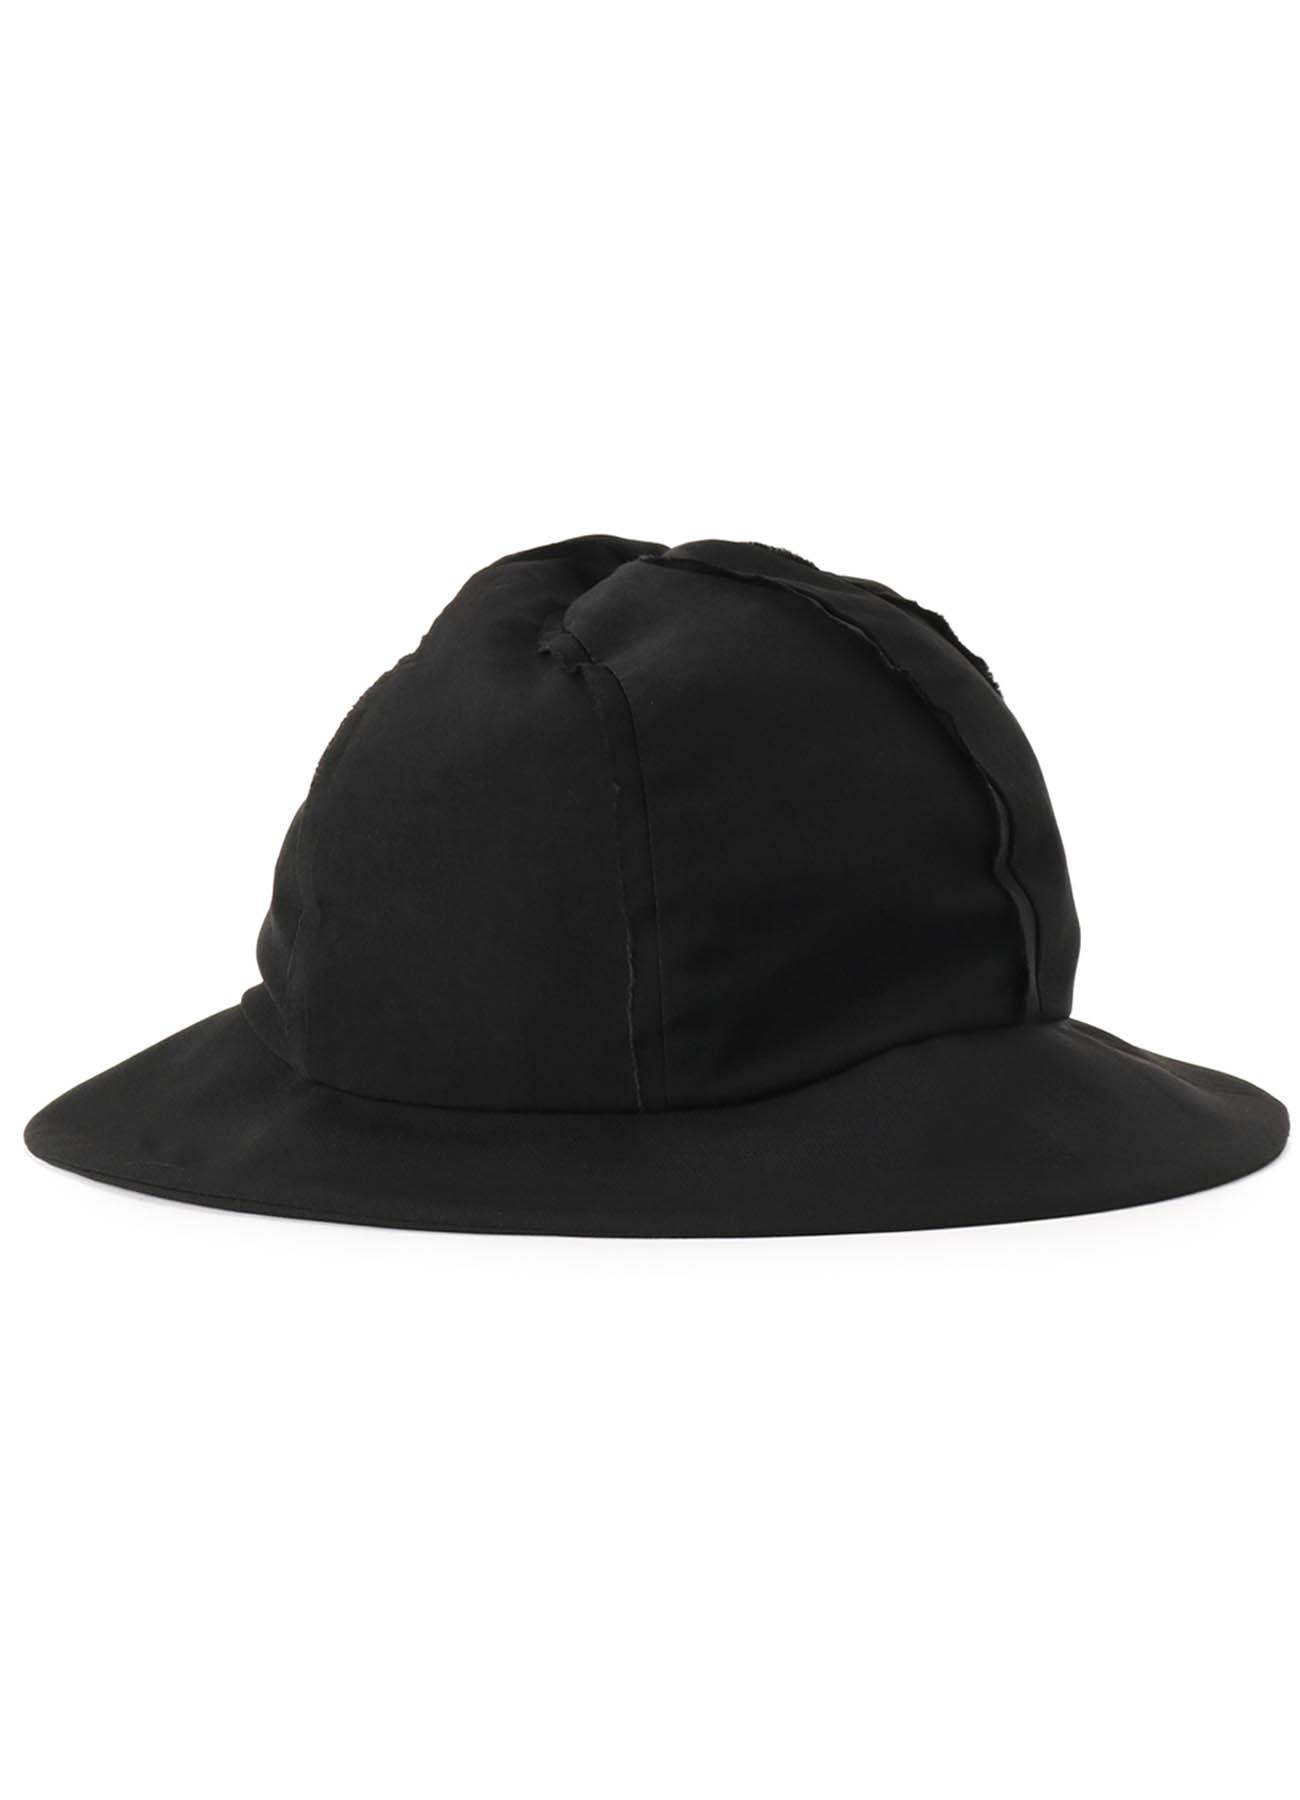 DECYN TWIST HAT